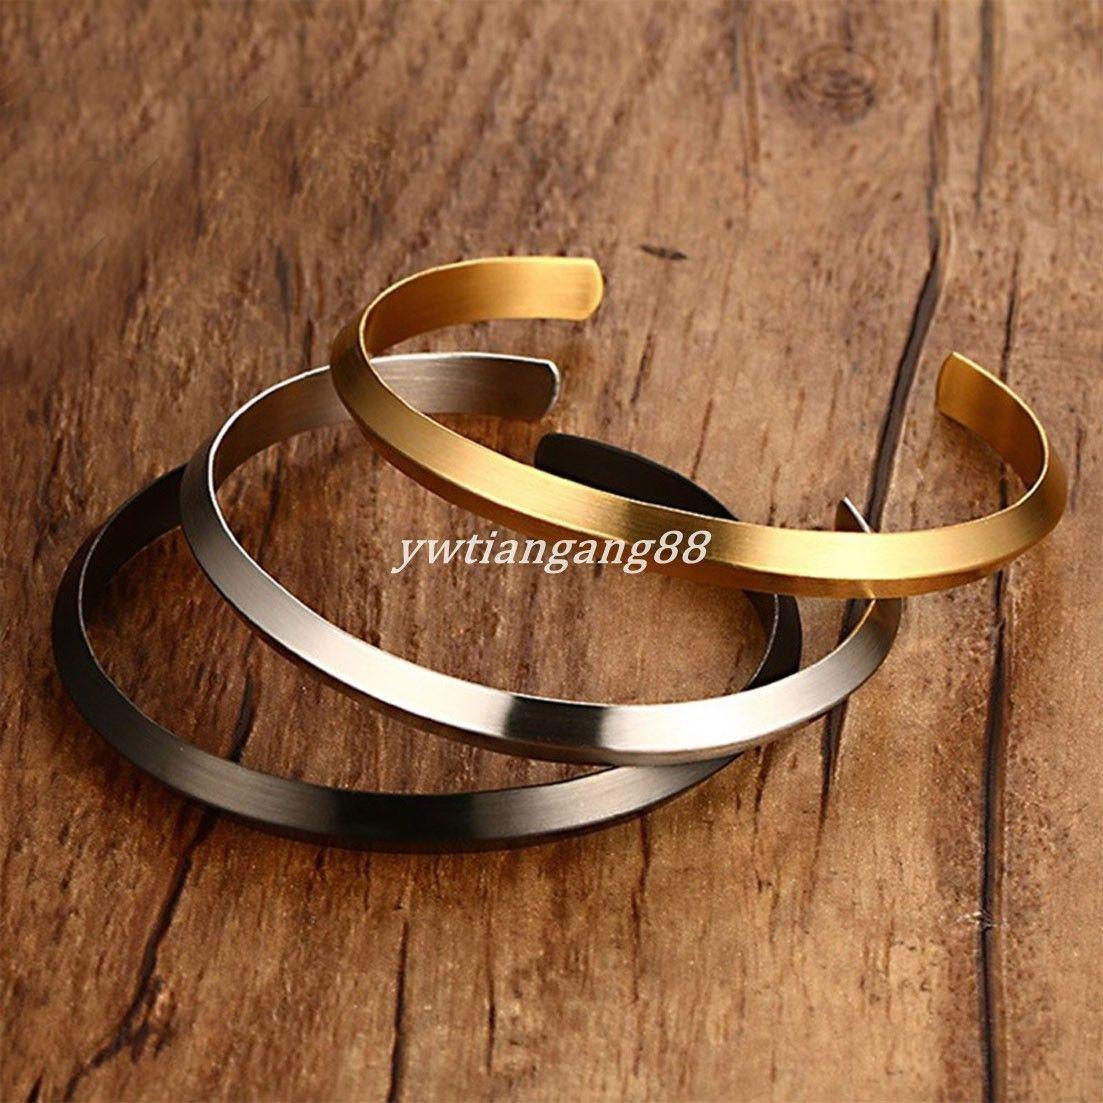 Fashion design stainless steel bracelet women menus open cuff bangle